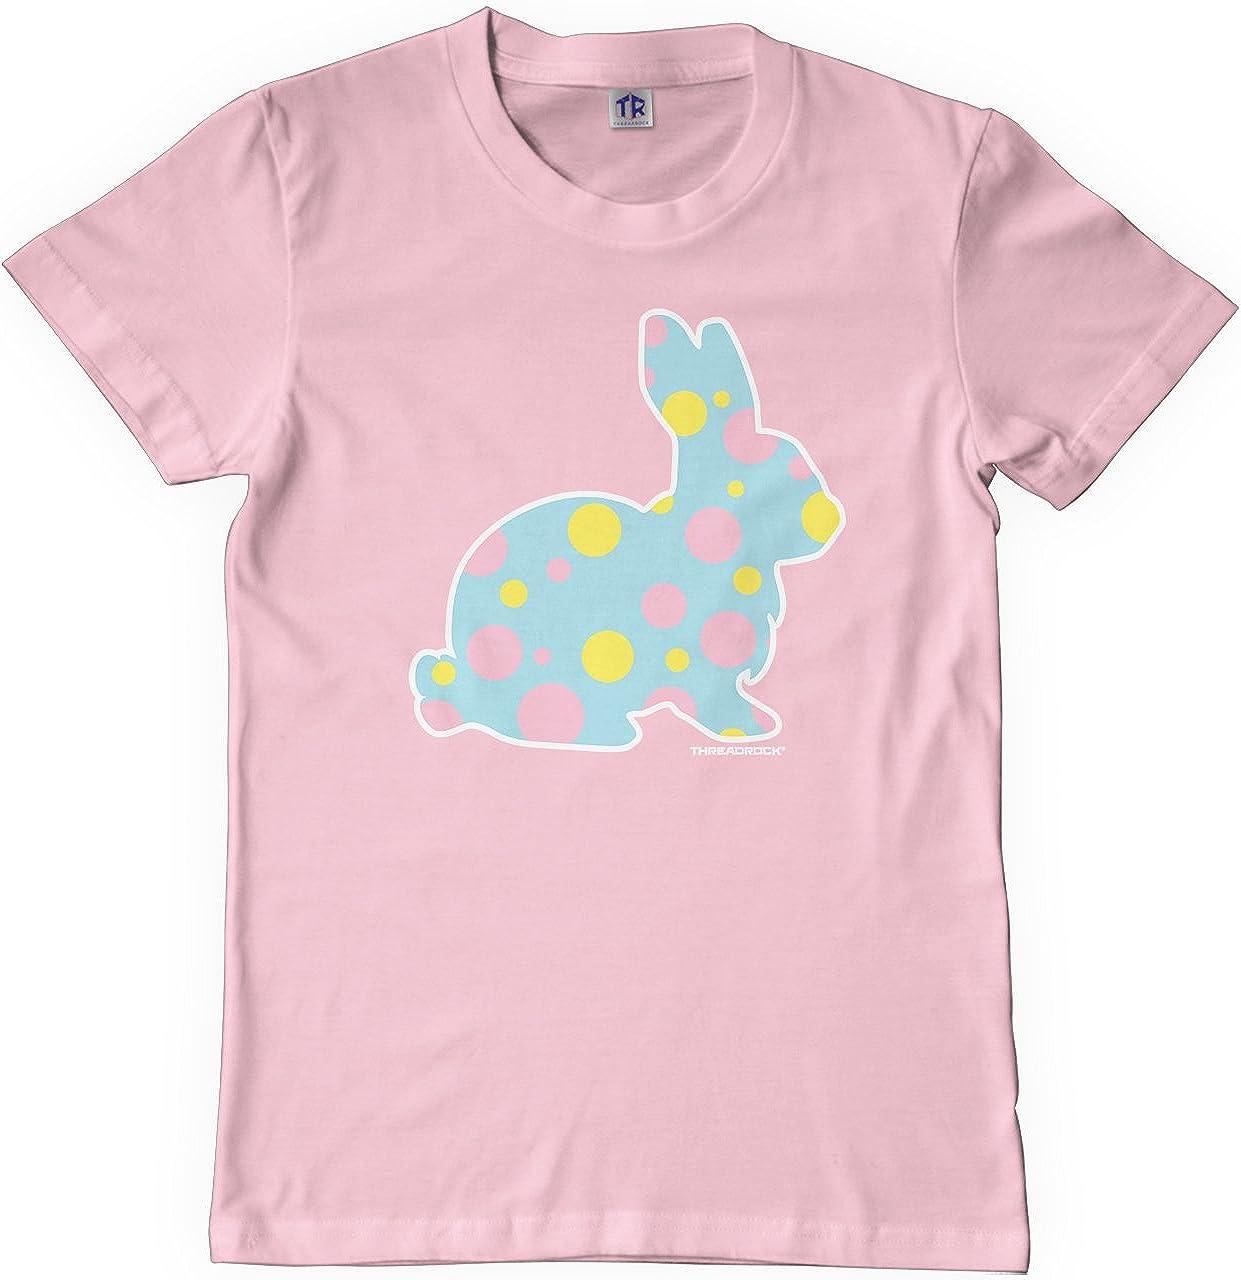 Threadrock Big Girls Blue Polka Dot Bunny Youth T-Shirt